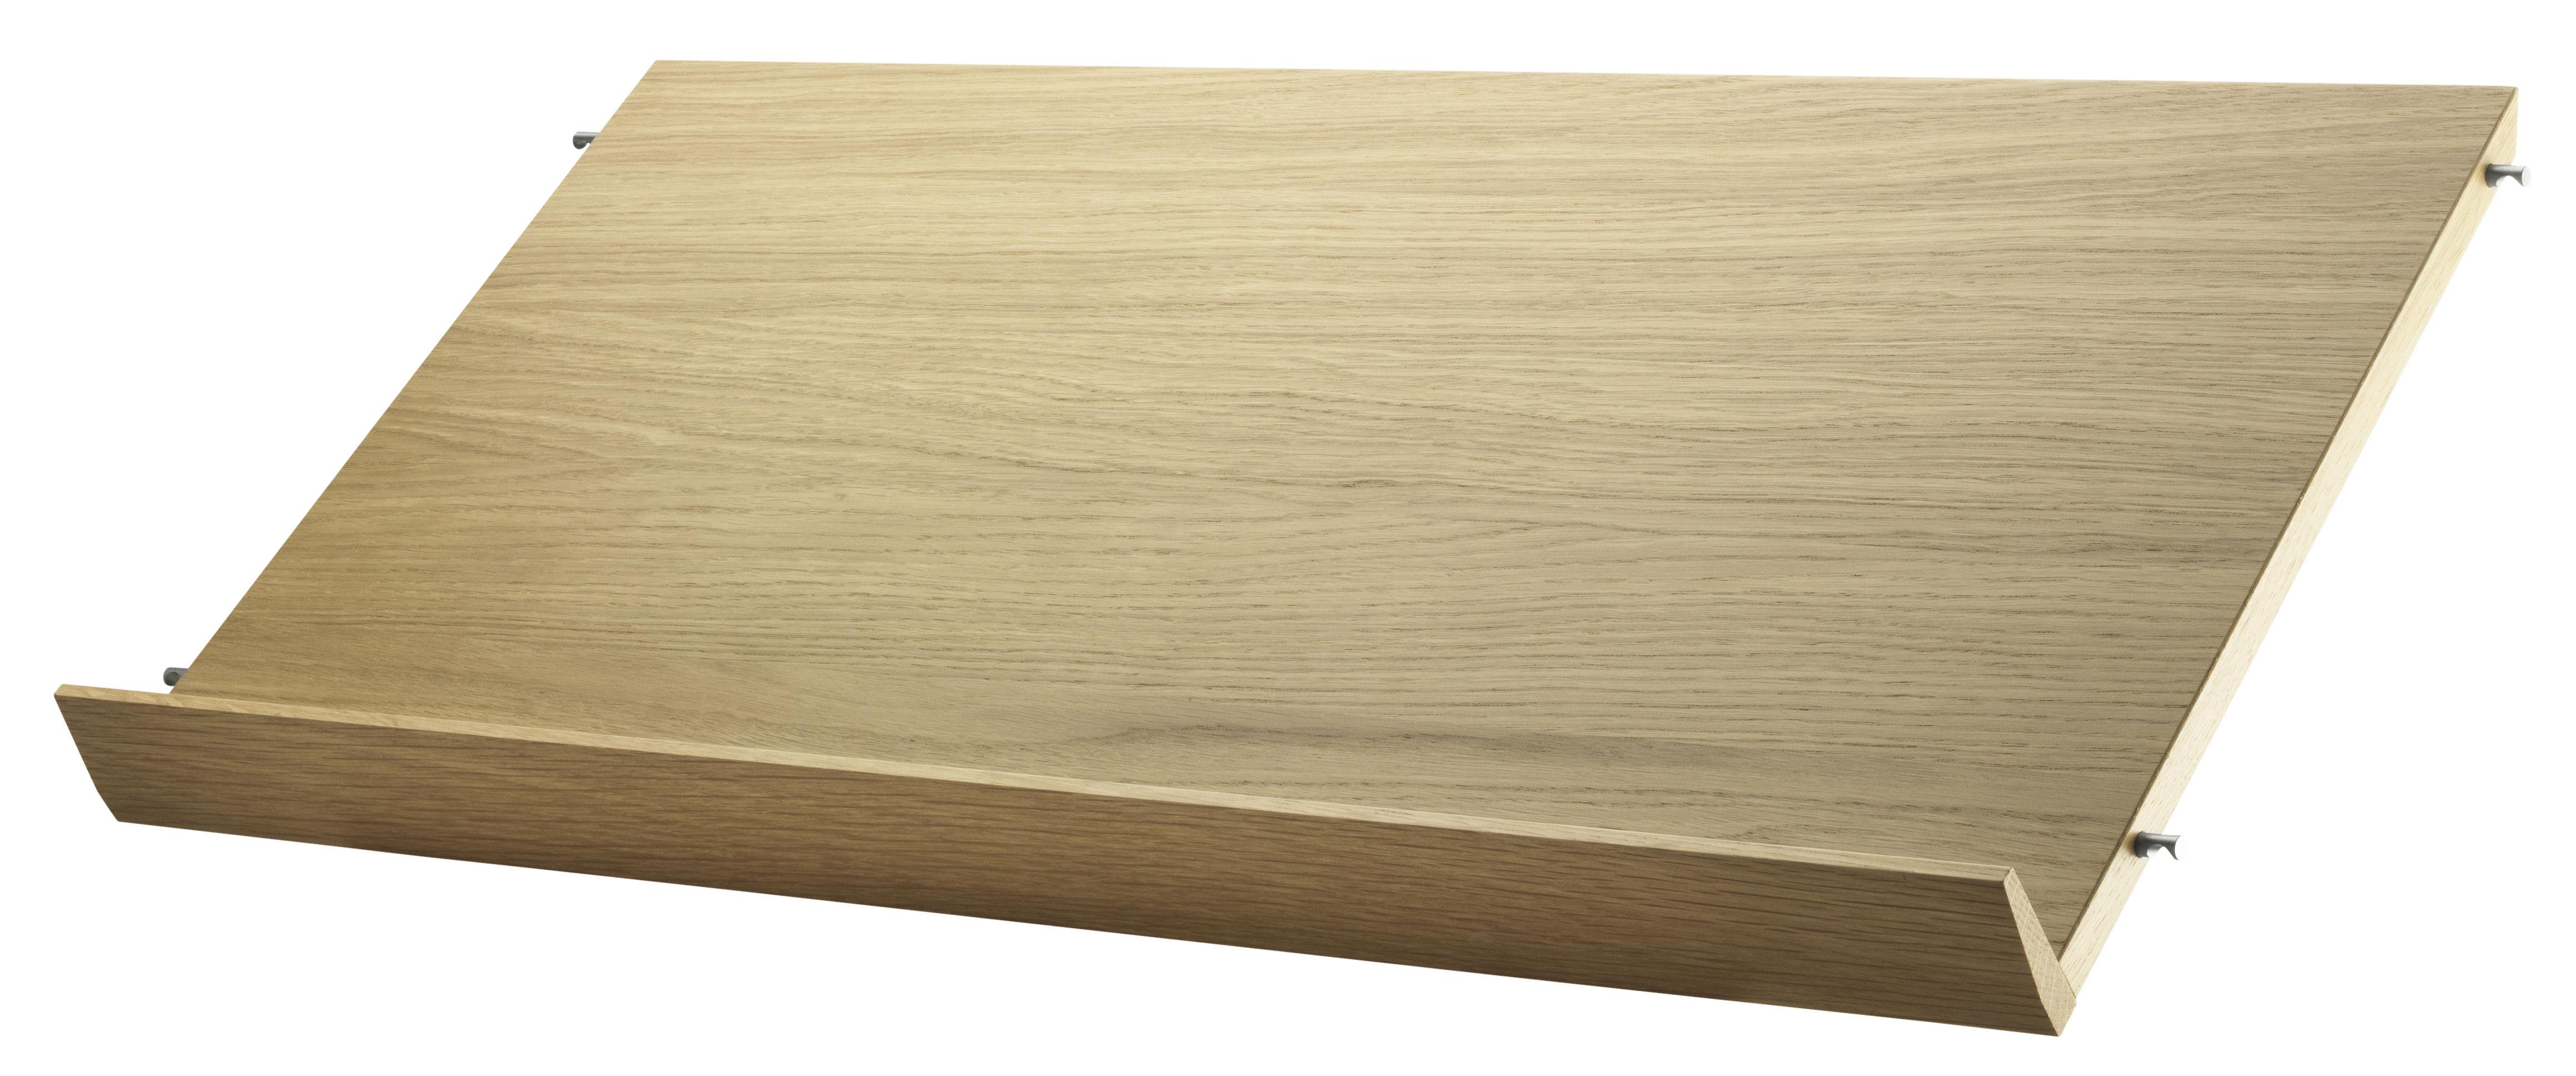 etag re string system bois porte revues chaussures l. Black Bedroom Furniture Sets. Home Design Ideas